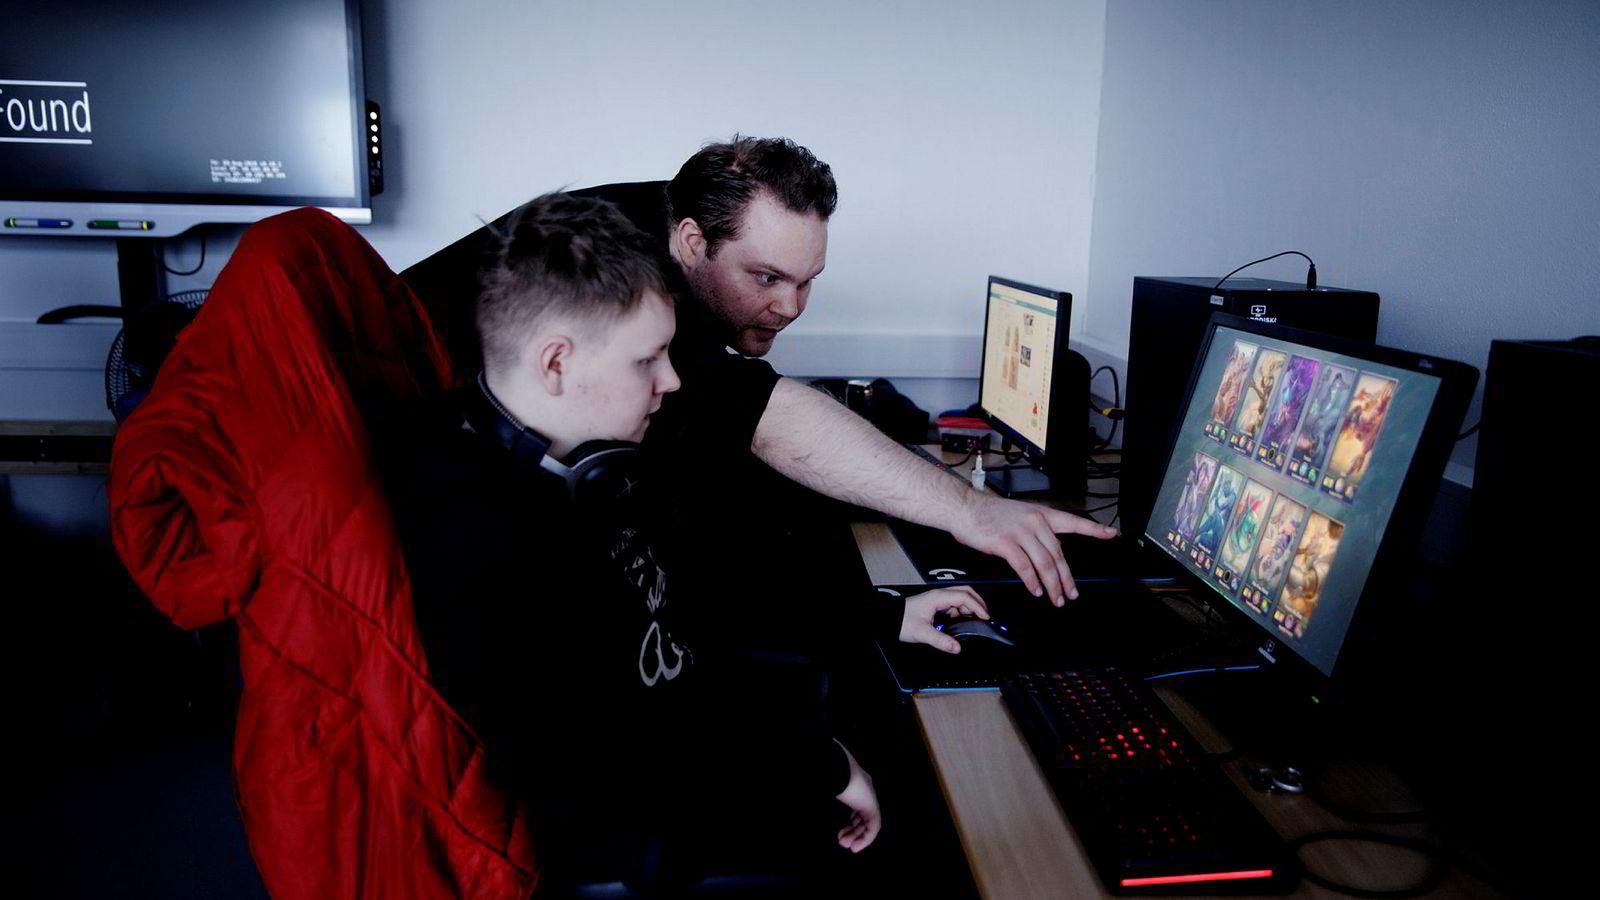 Sindre Rygg sier han ser at elevene blomstrer i flere fag etter at de begynte med gaming. Her med elev Eirik Mikael Larsen (18).